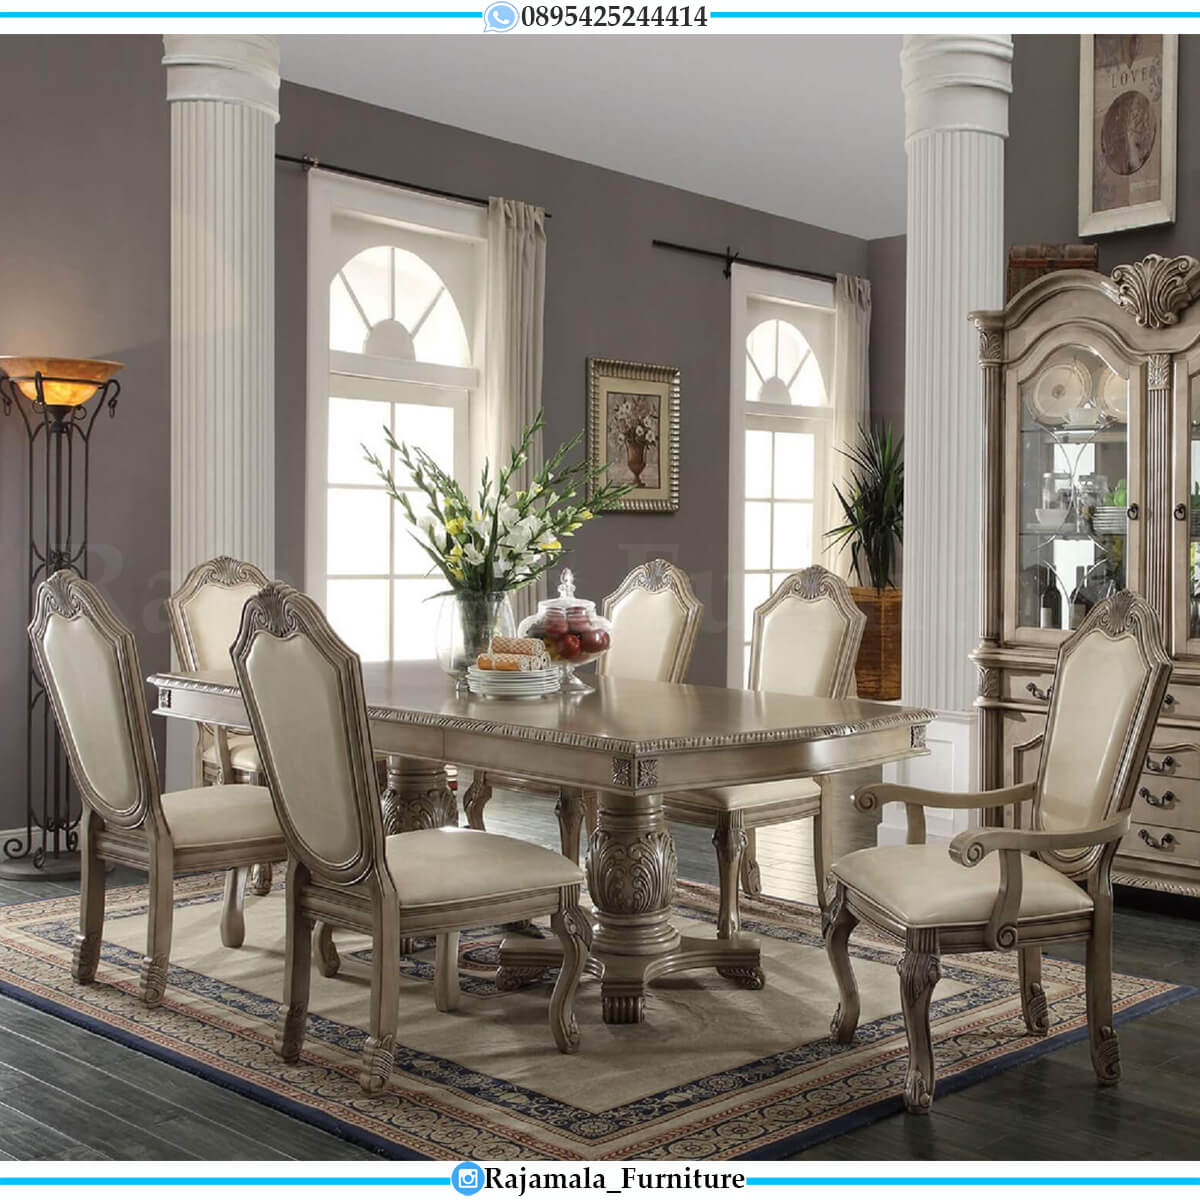 Harga Meja Makan Minimalis Klasik Ukir Jepara Simple Design Furniture Luxury RM-0591